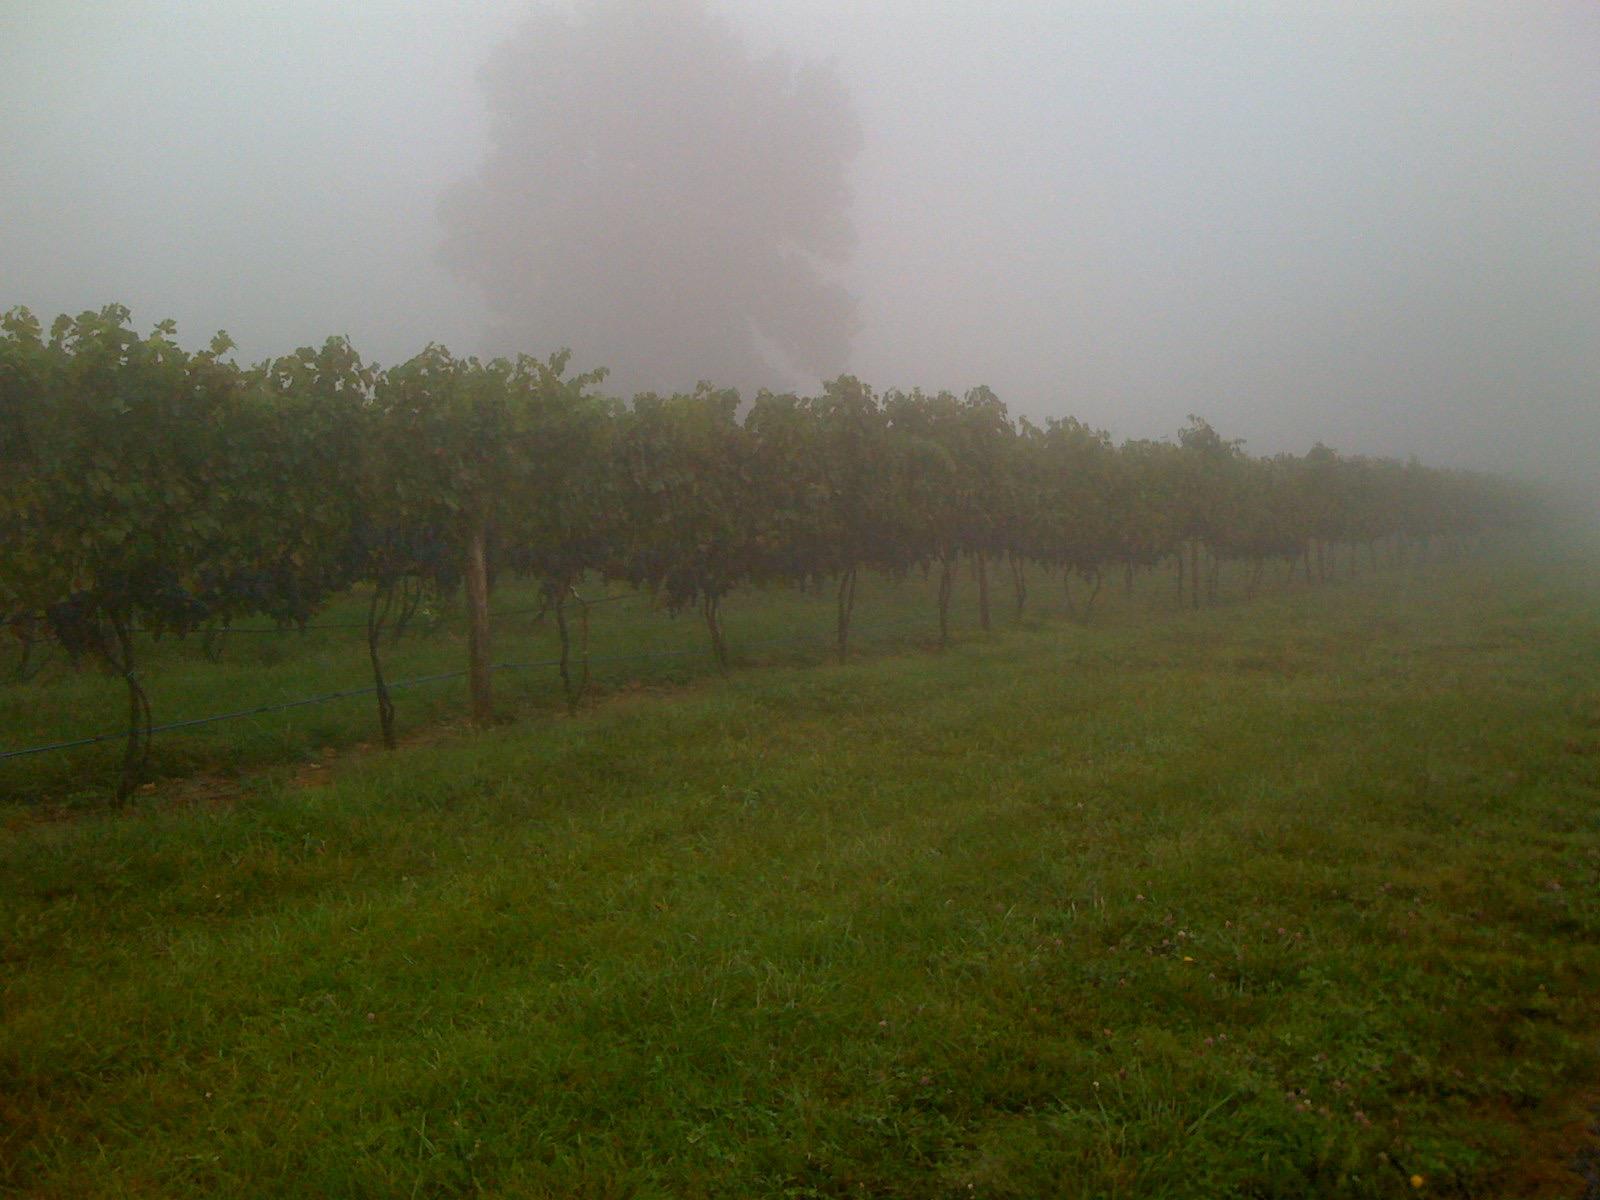 By Garth Woodruff - Linden, VA. Fox Meadow Winery.